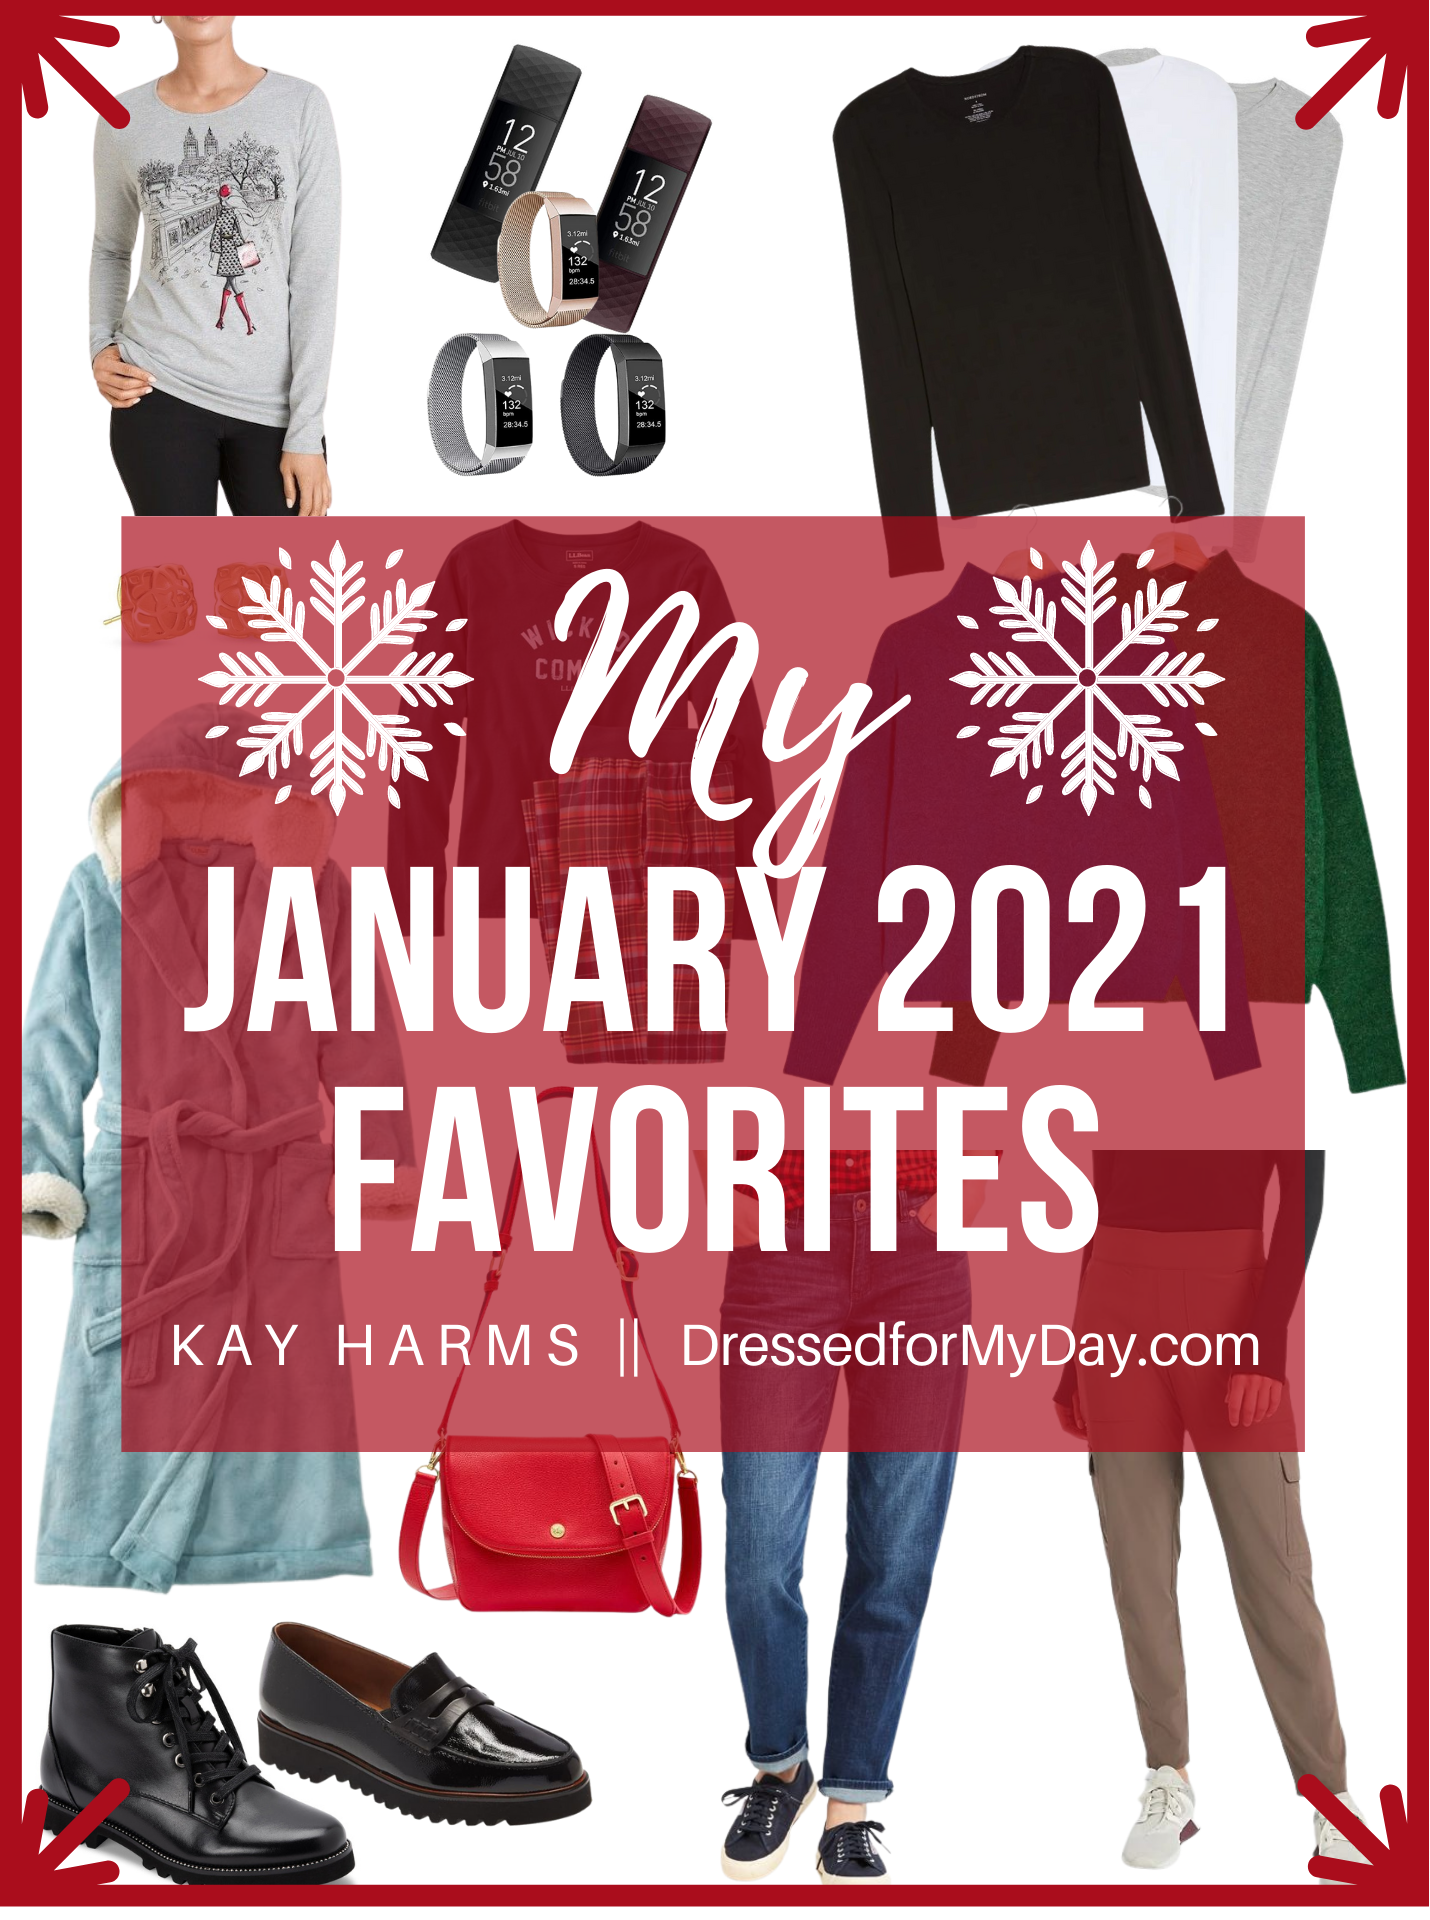 My January 2021 Favorites